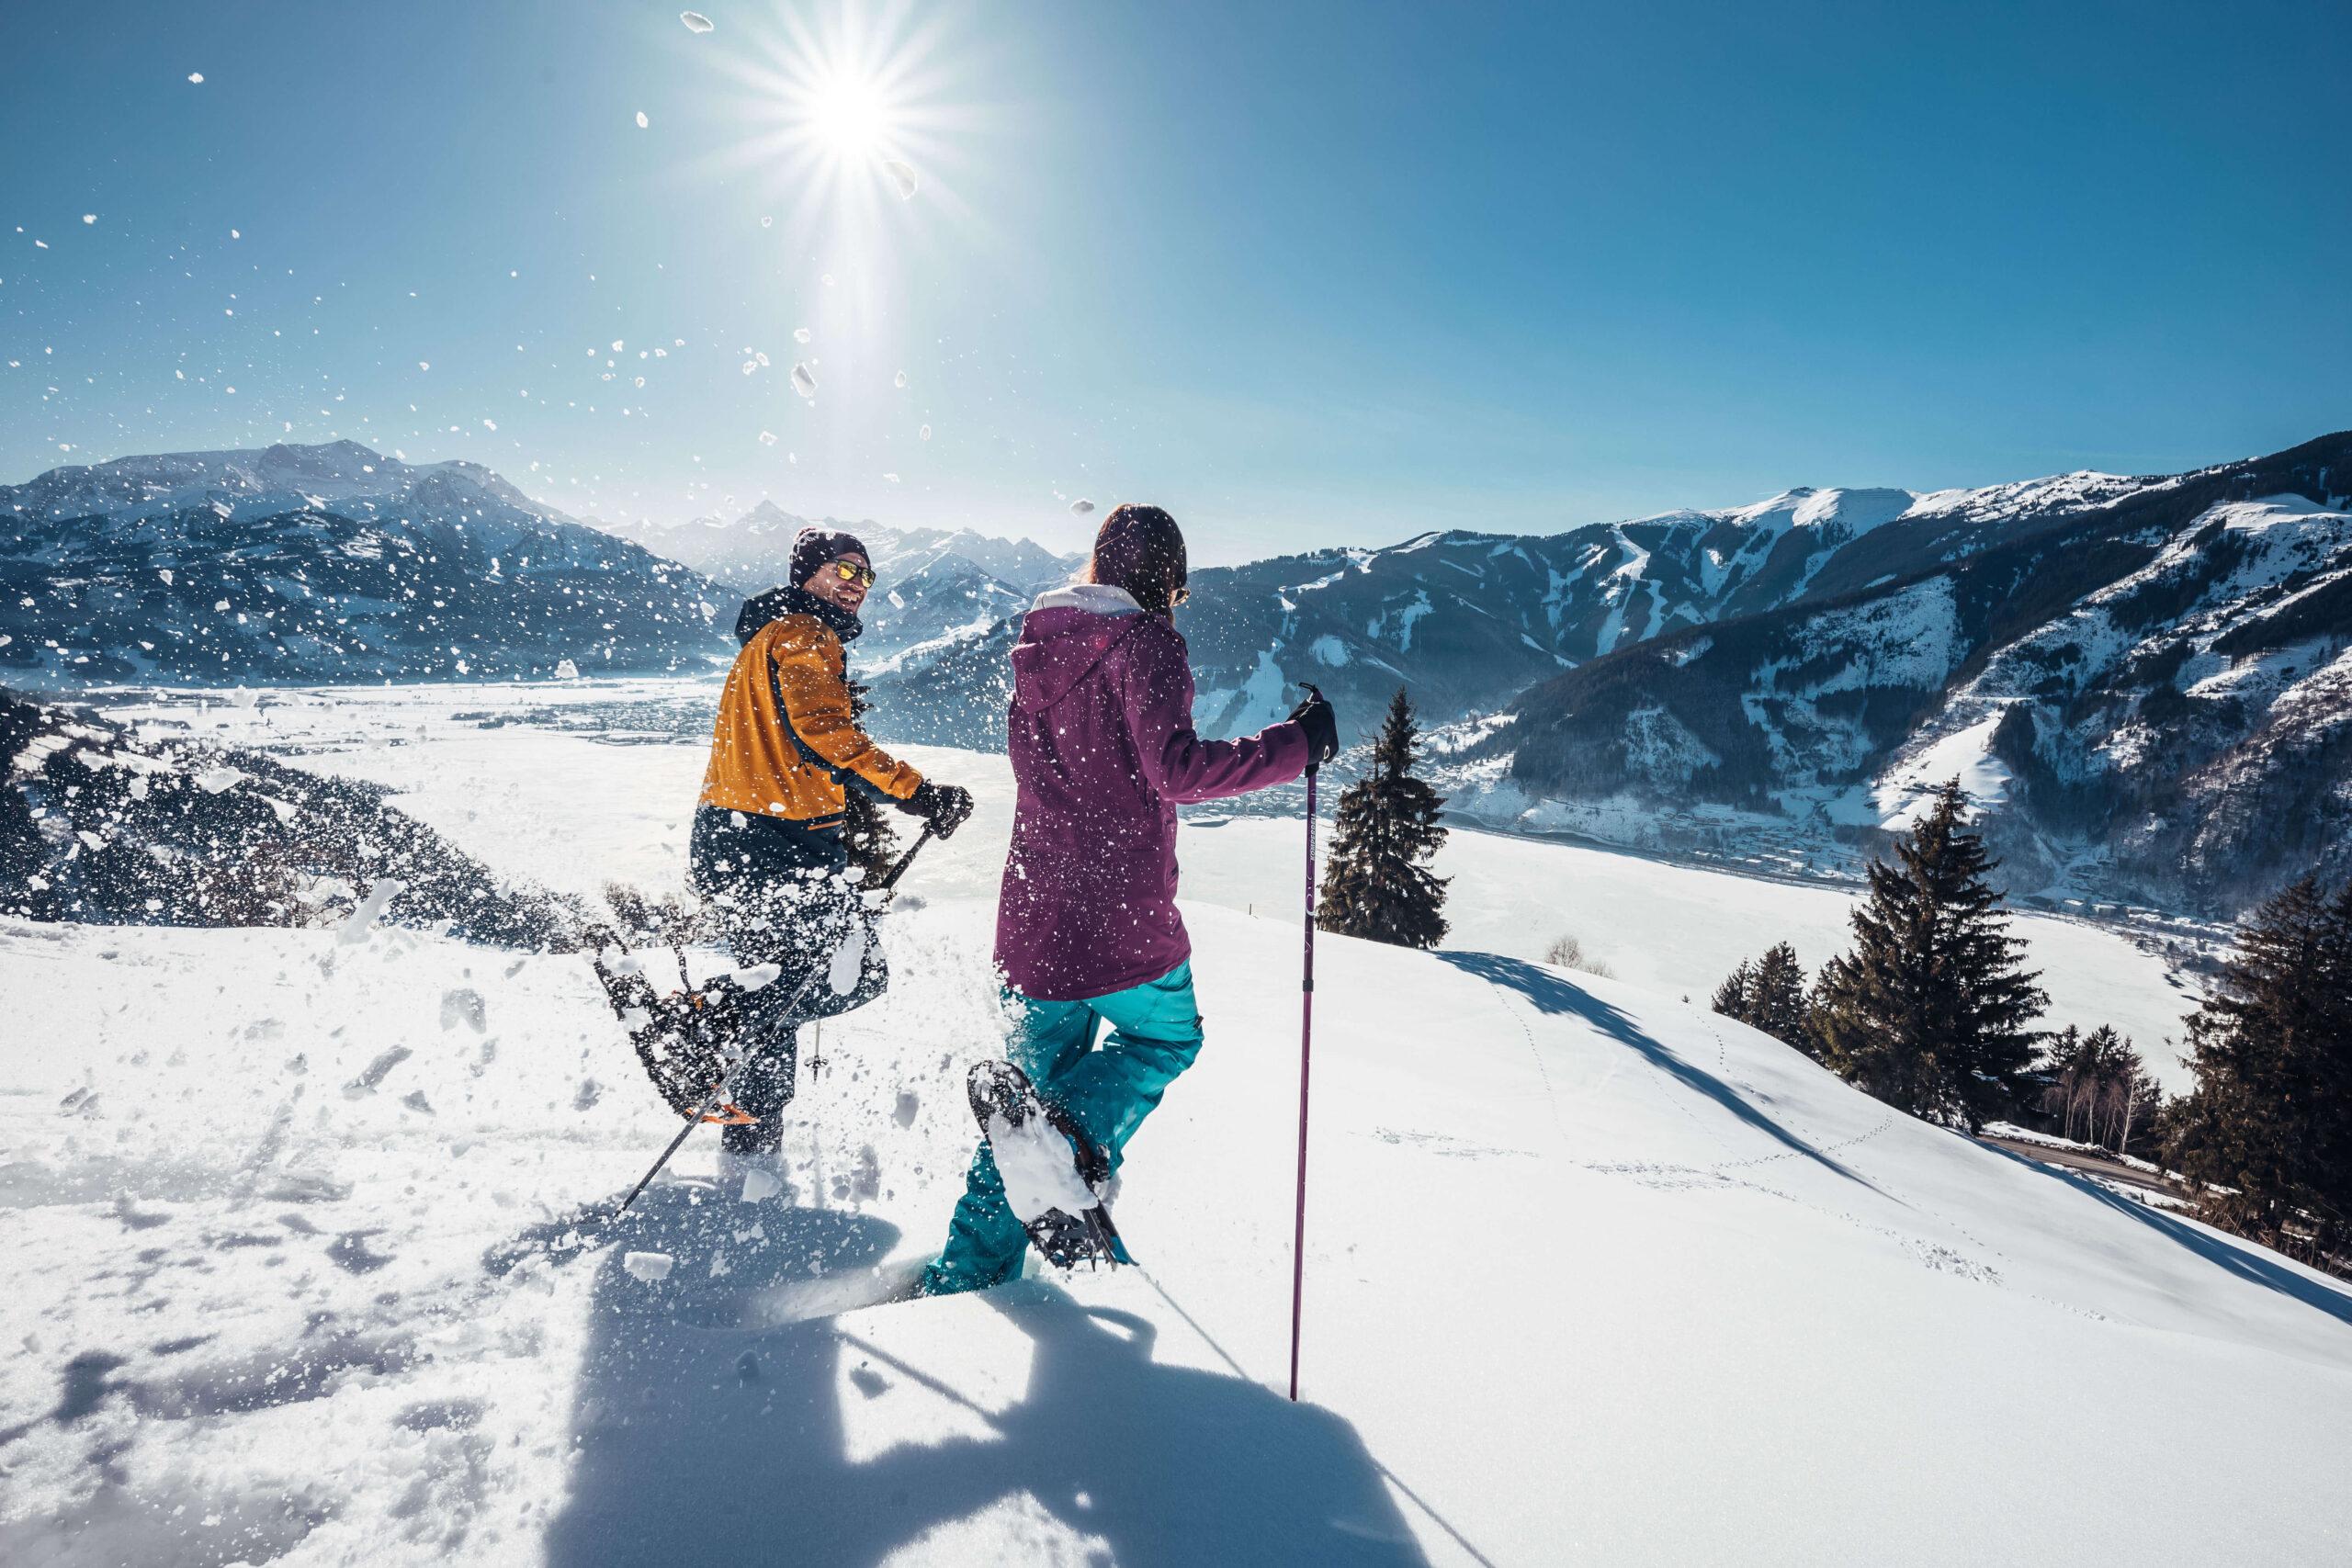 Schneeschuhwanderer in Thumersbach